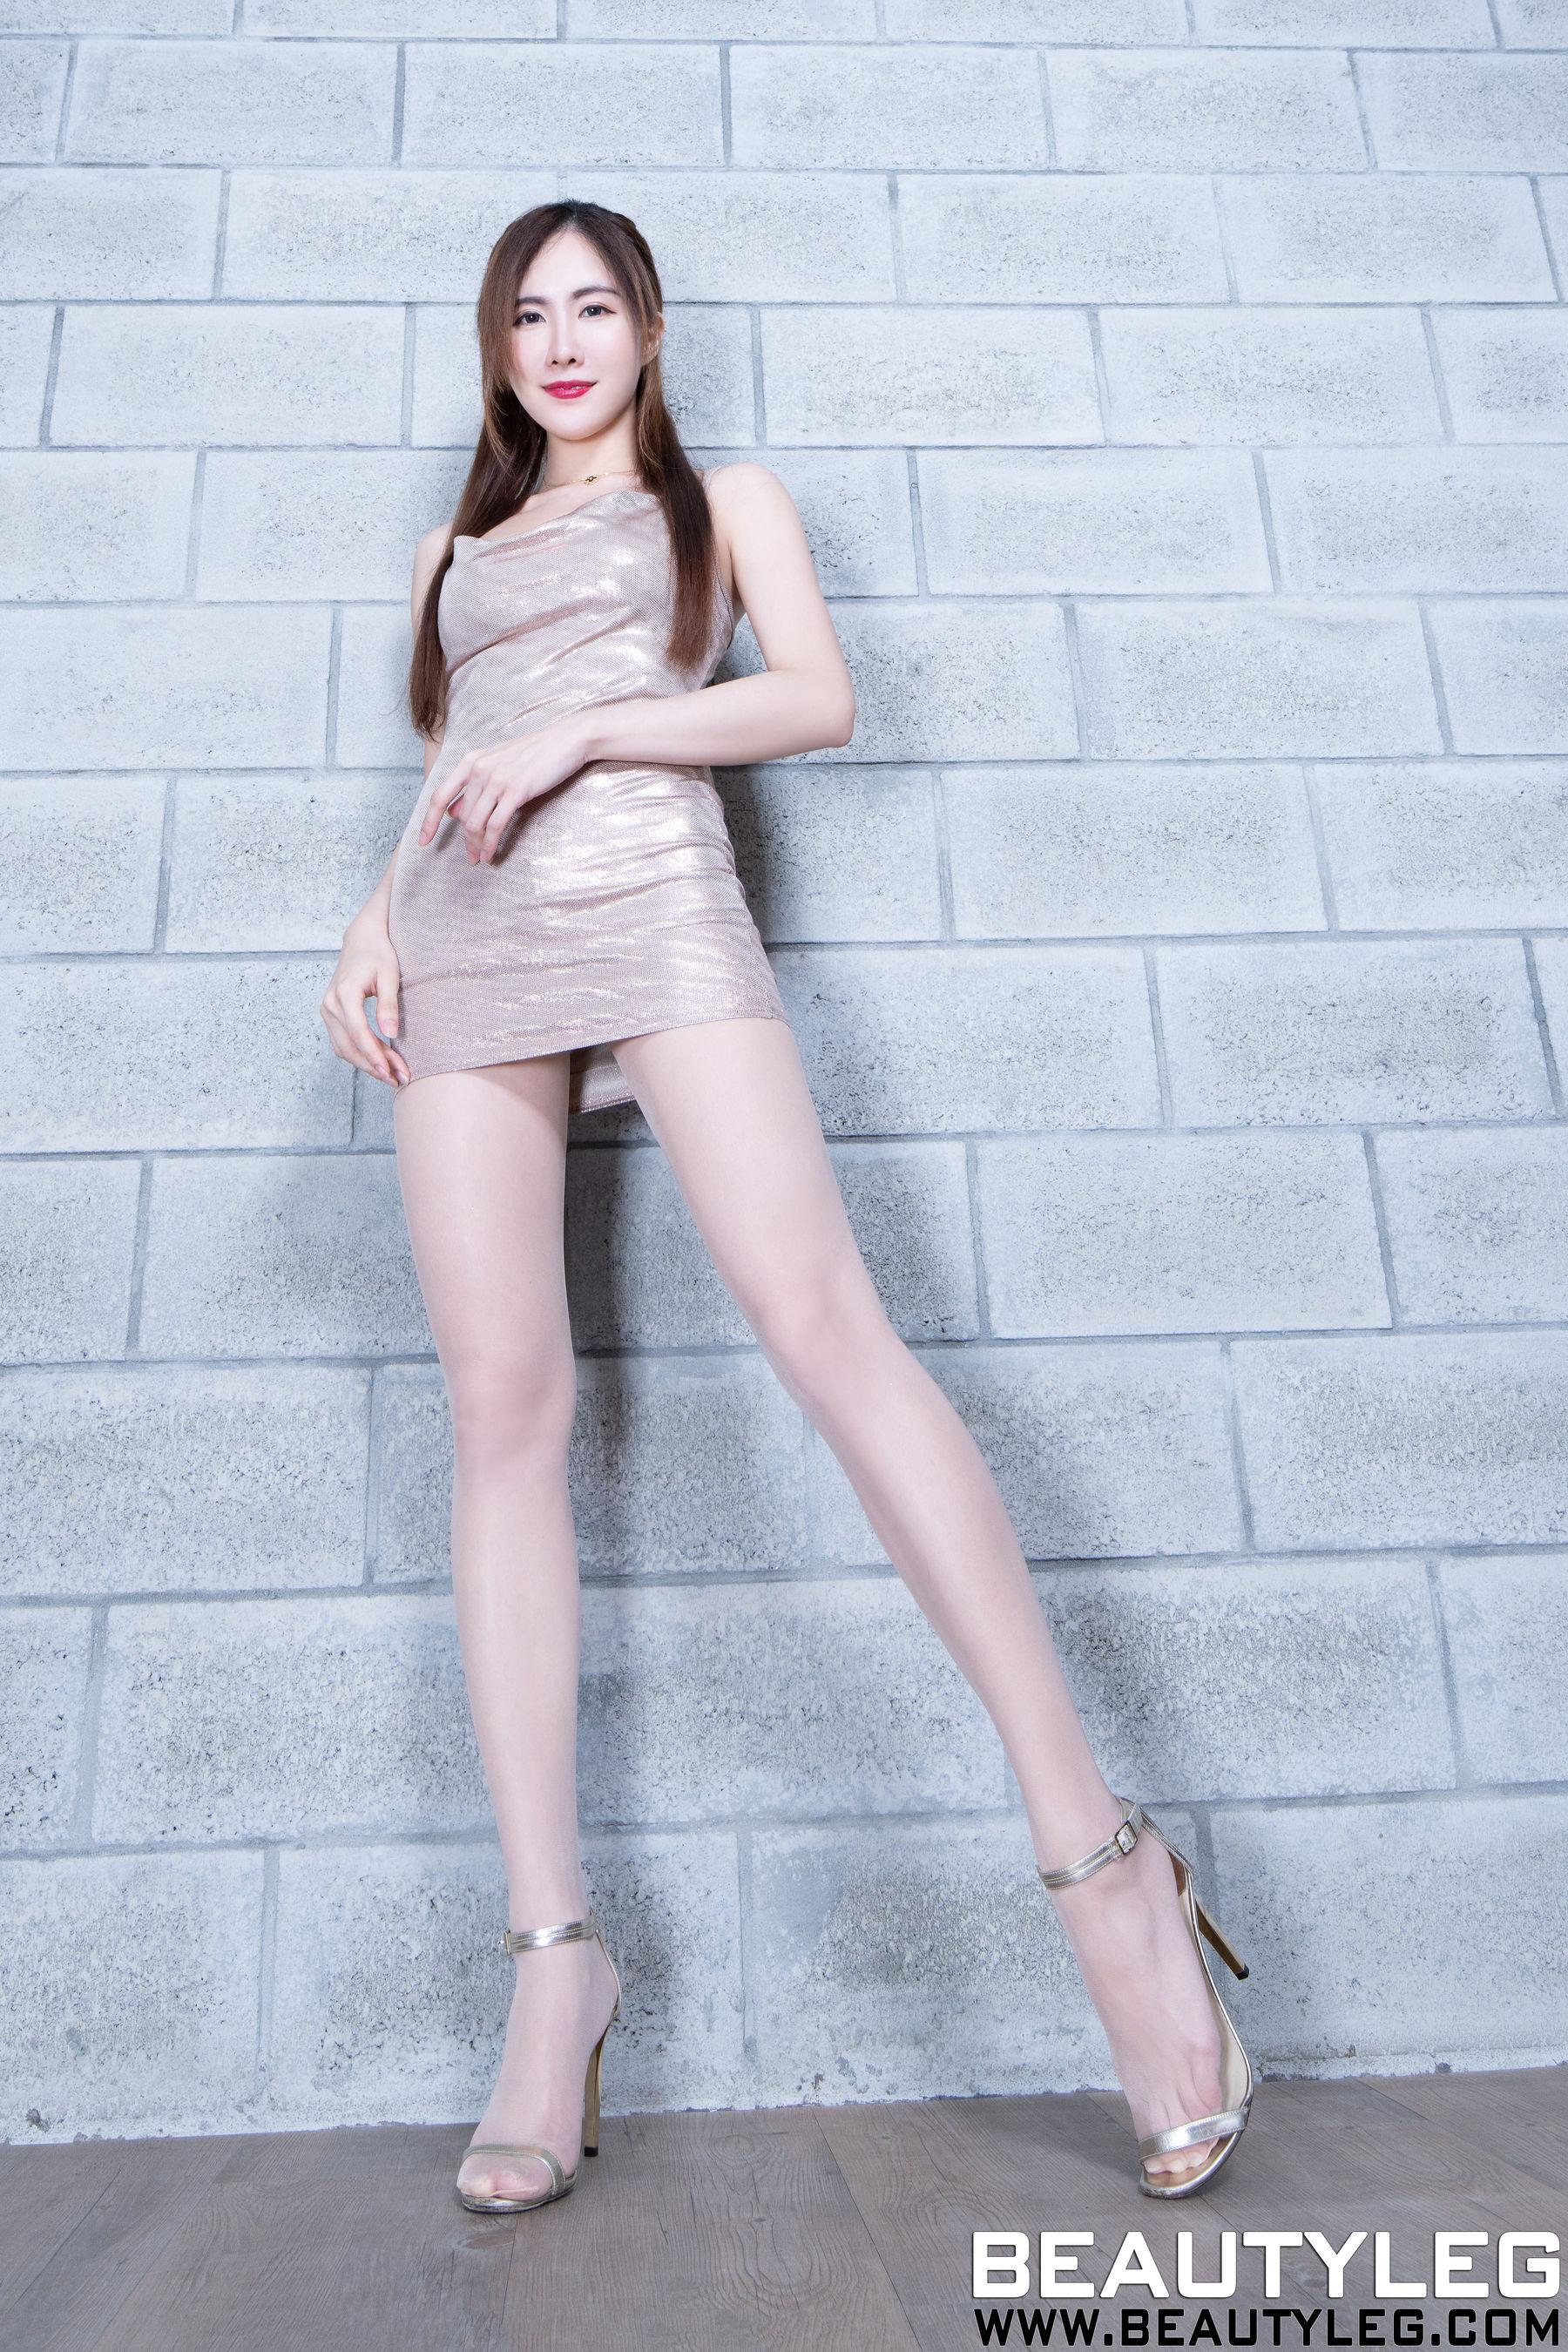 VOL.1047 [Beautyleg]丝袜美腿:曾妍希(腿模Dora)超高清个人性感漂亮大图(48P)